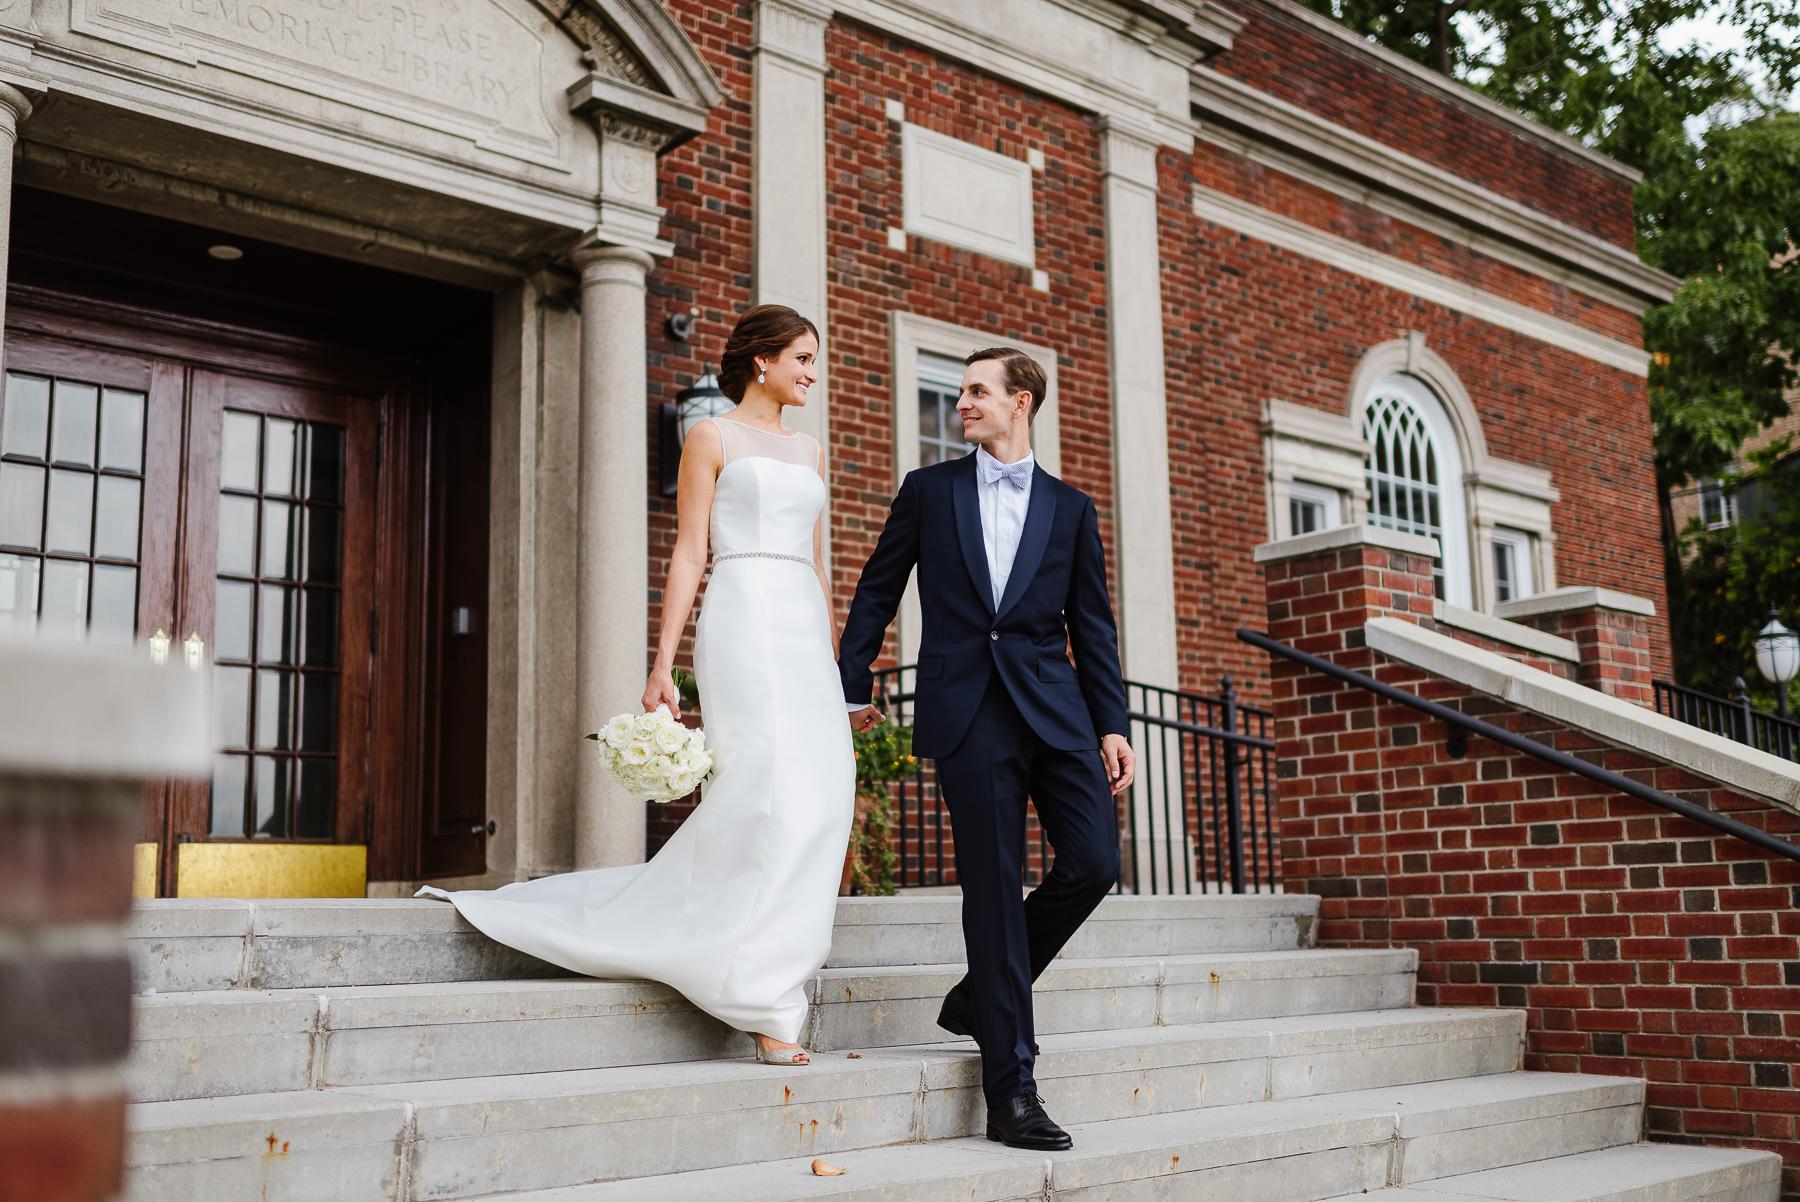 72-J Crew Wedding New Jersey Wedding Photographer J Crew Weddings.jpg